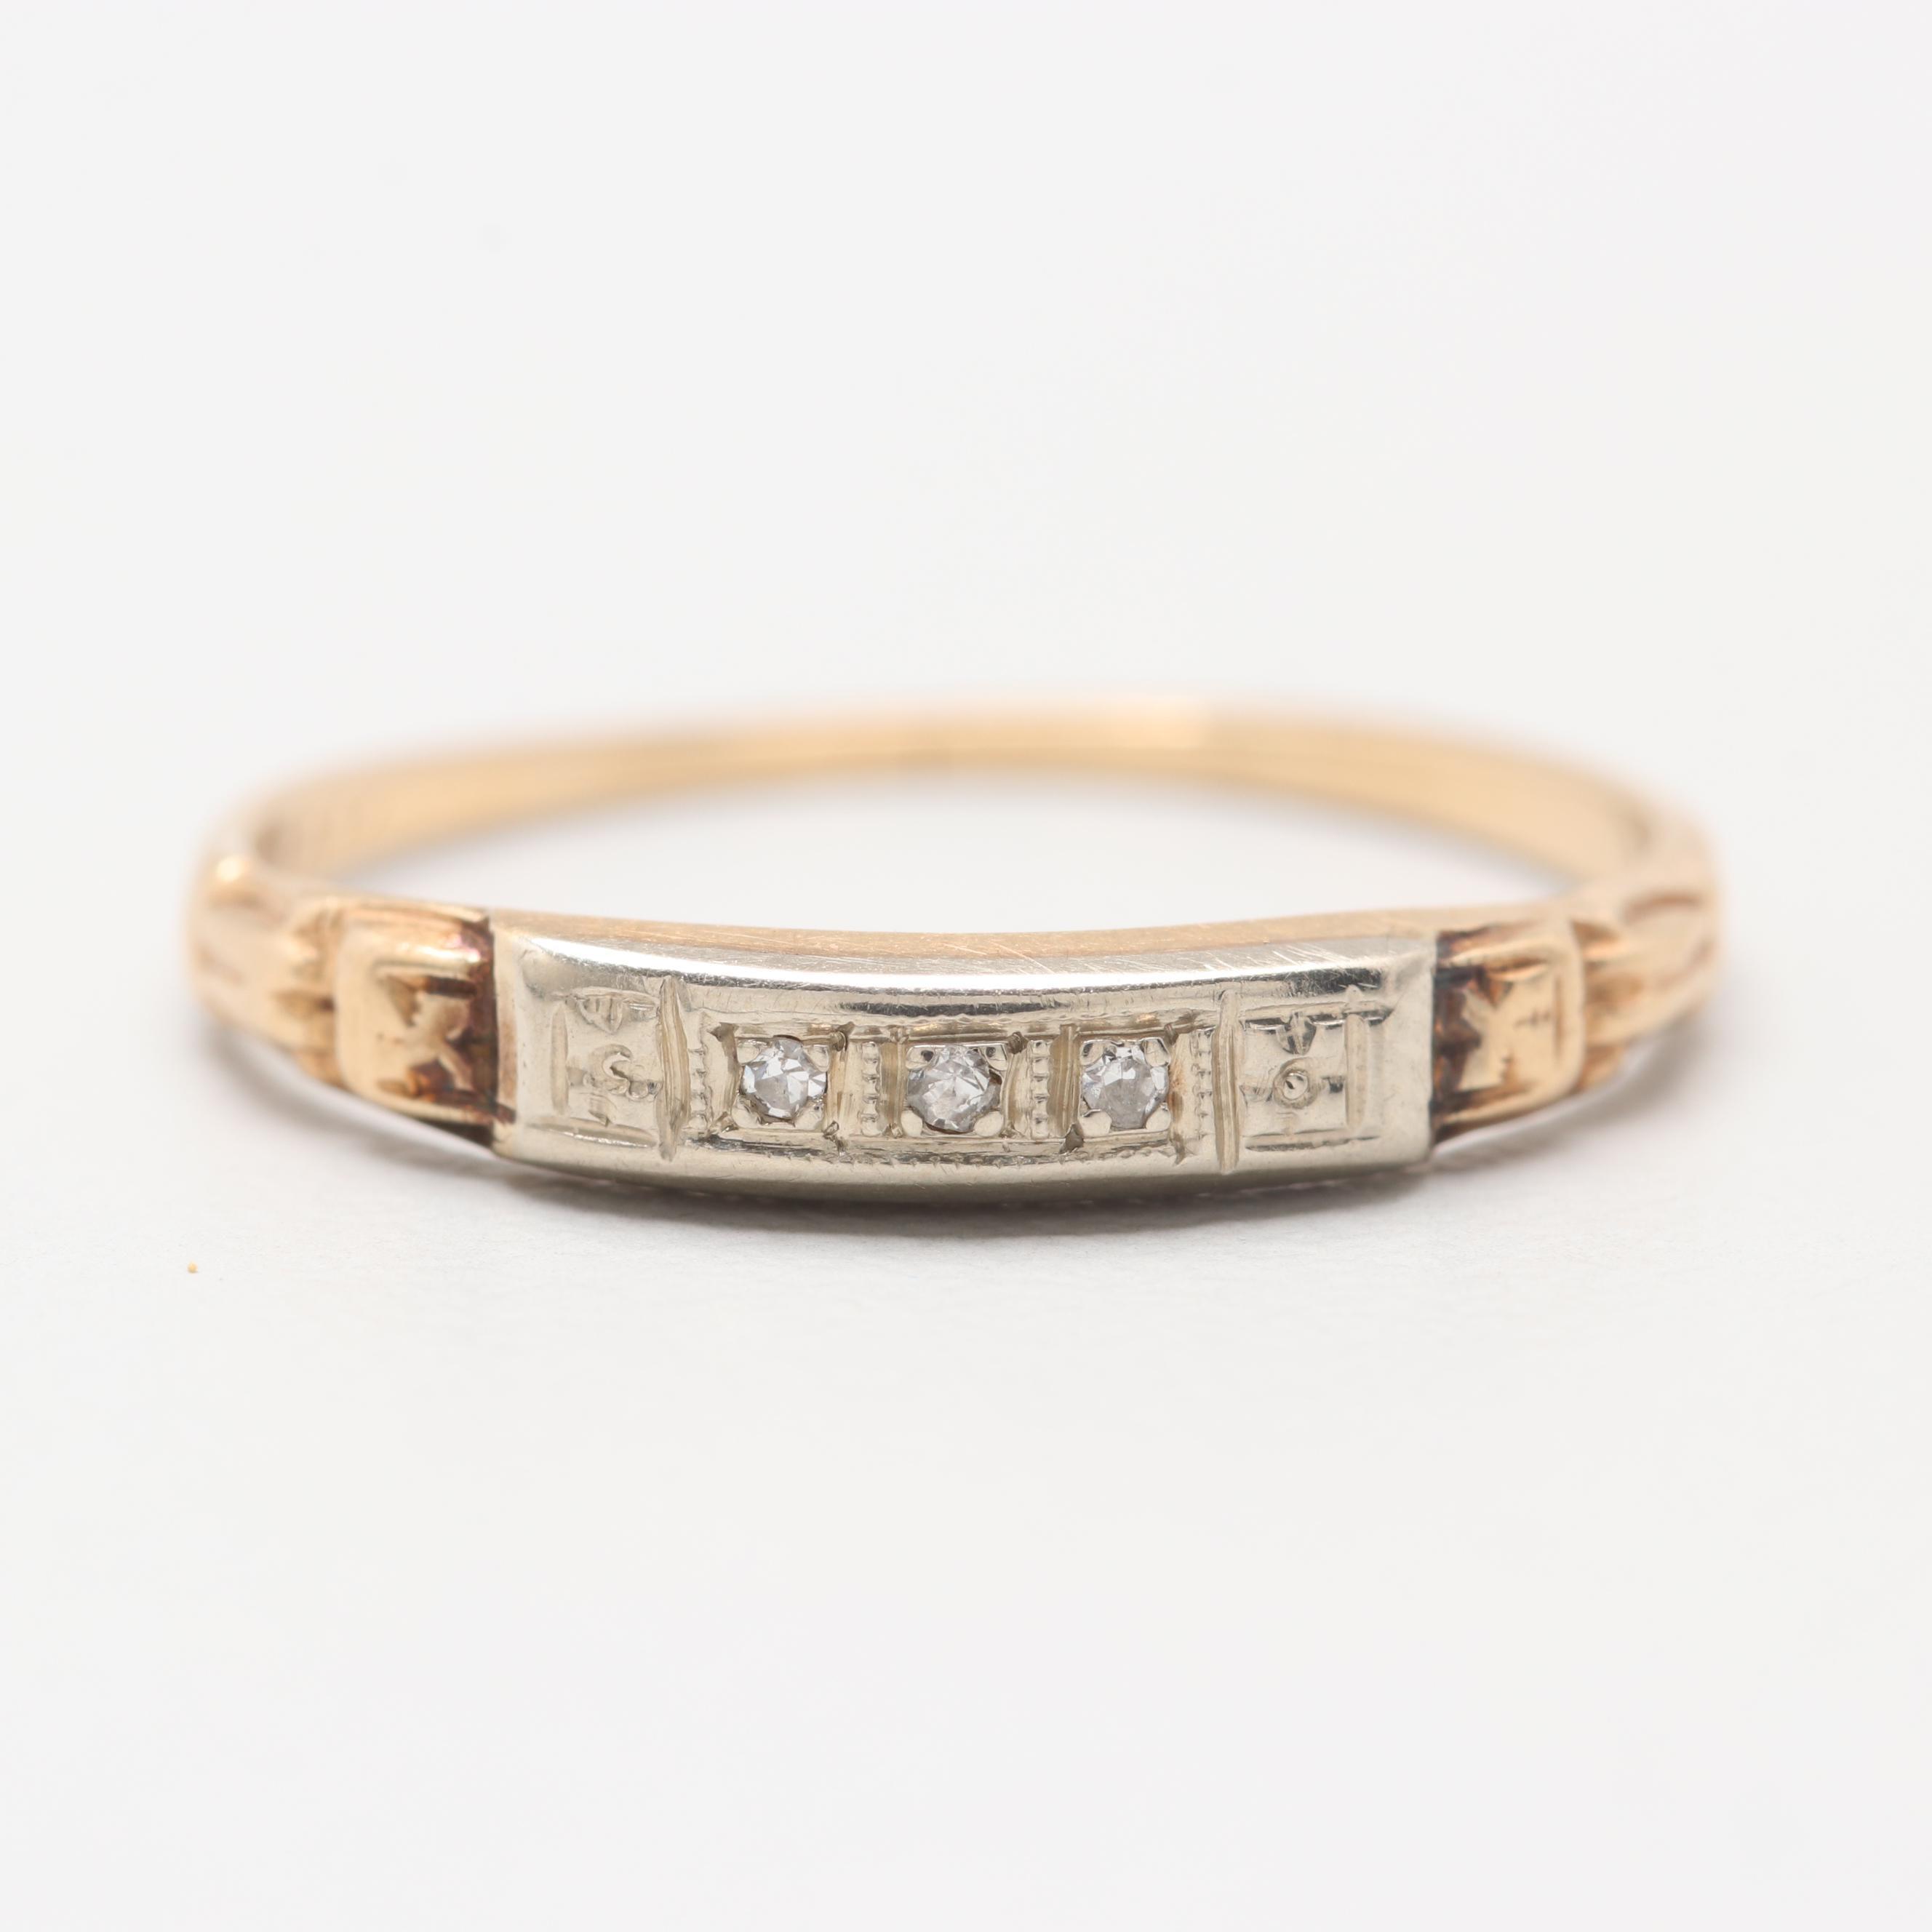 Circa 1930s 14K Yellow Gold Diamond Ring